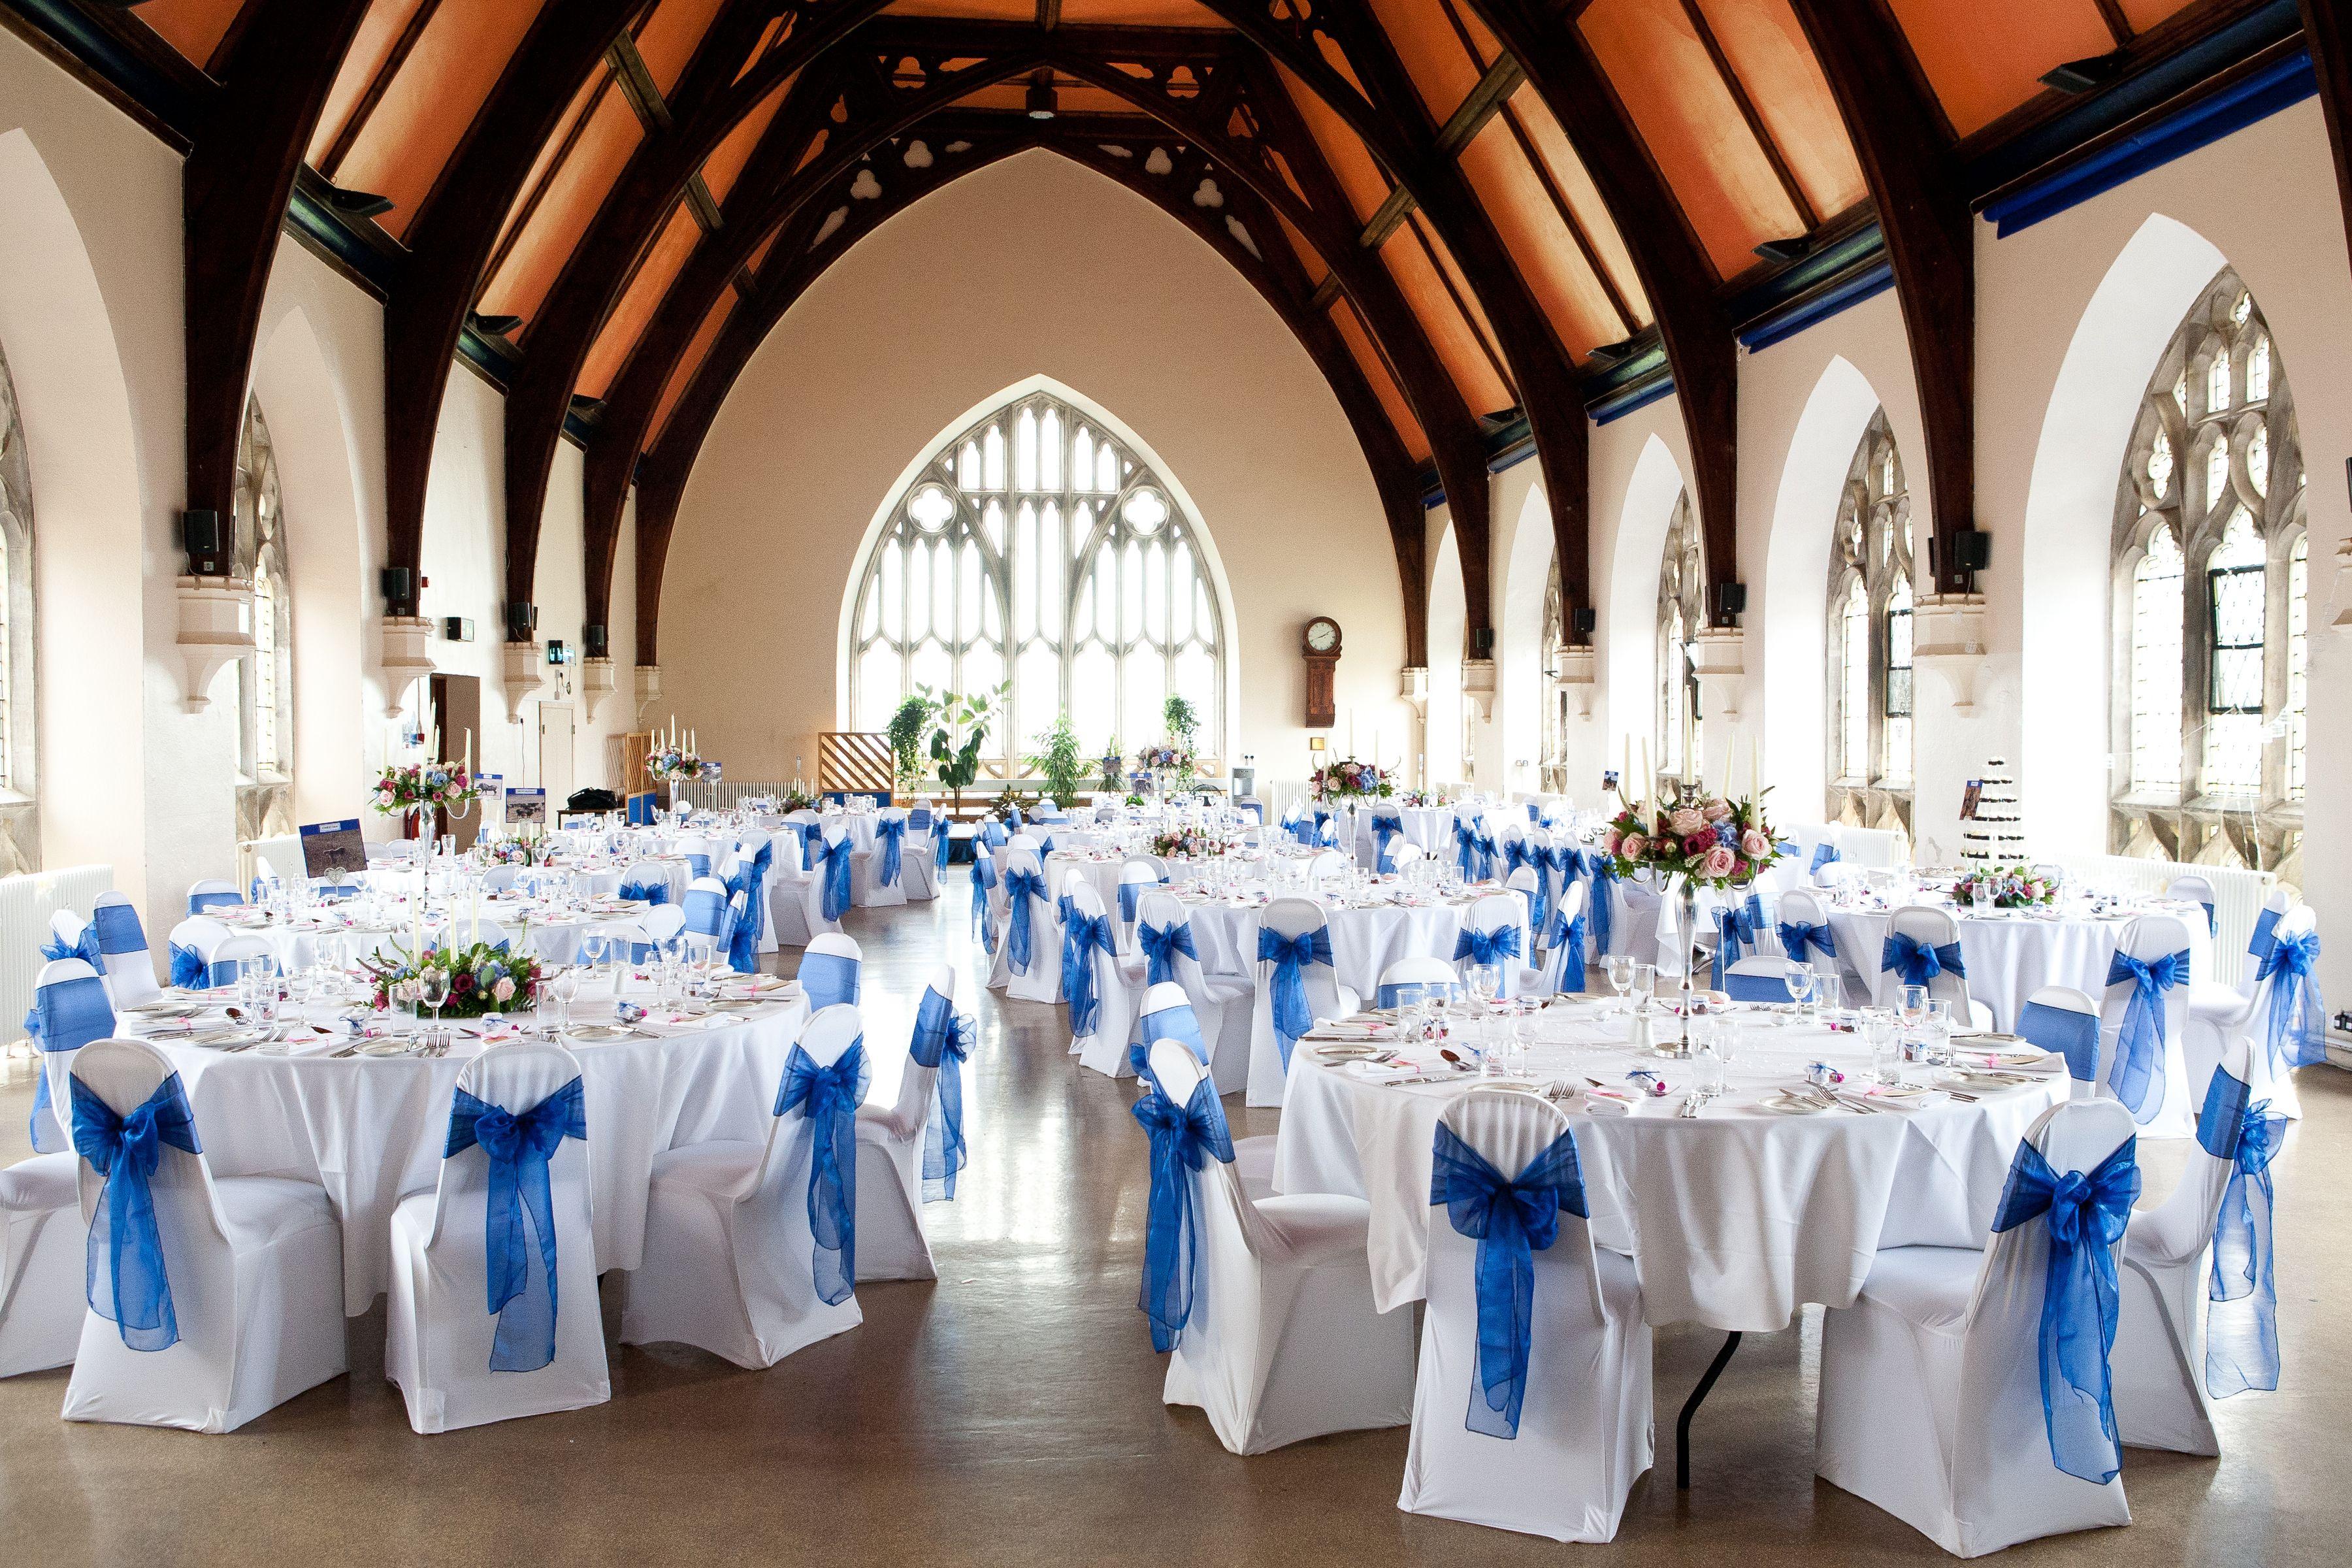 Clifton College As A Wedding Reception Venue Wonderful Architecture